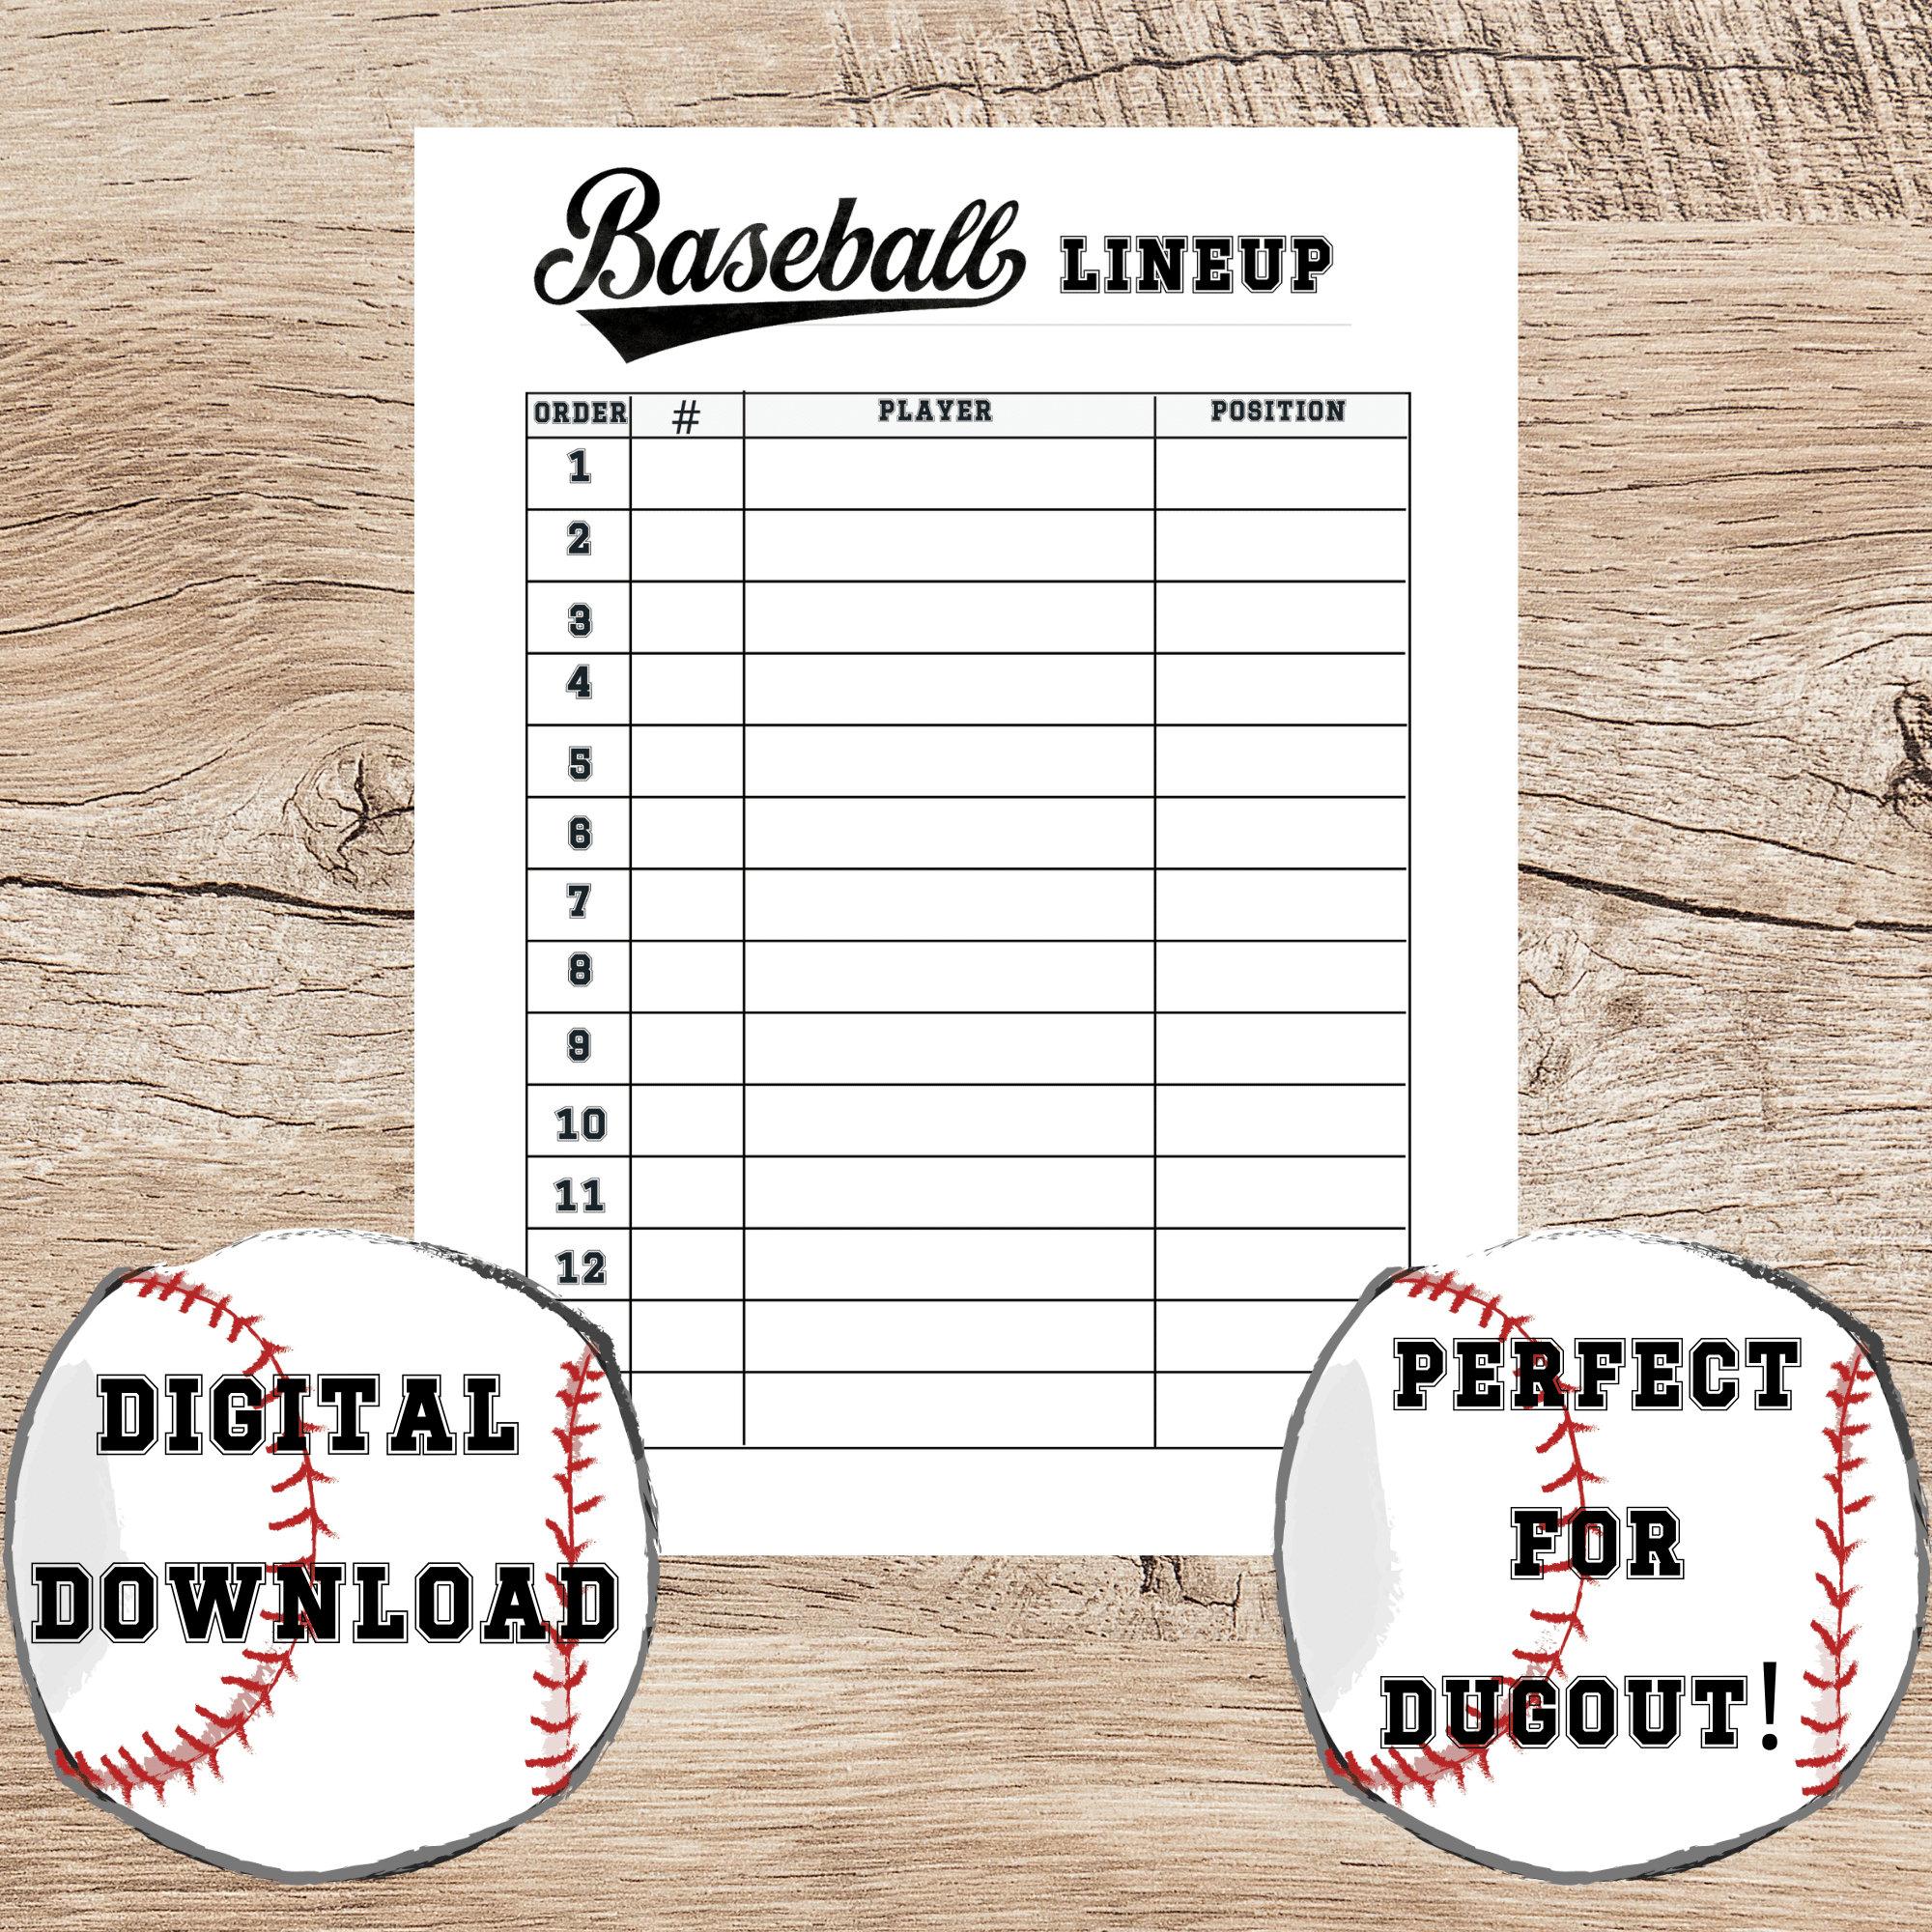 Baseball Lineup Printable, Team Organizer, Tee Ball Roster Chart, 22 player  list for Dugout, Batting Lineup, Baseball Dugout List Throughout Baseball Lineup Card Template